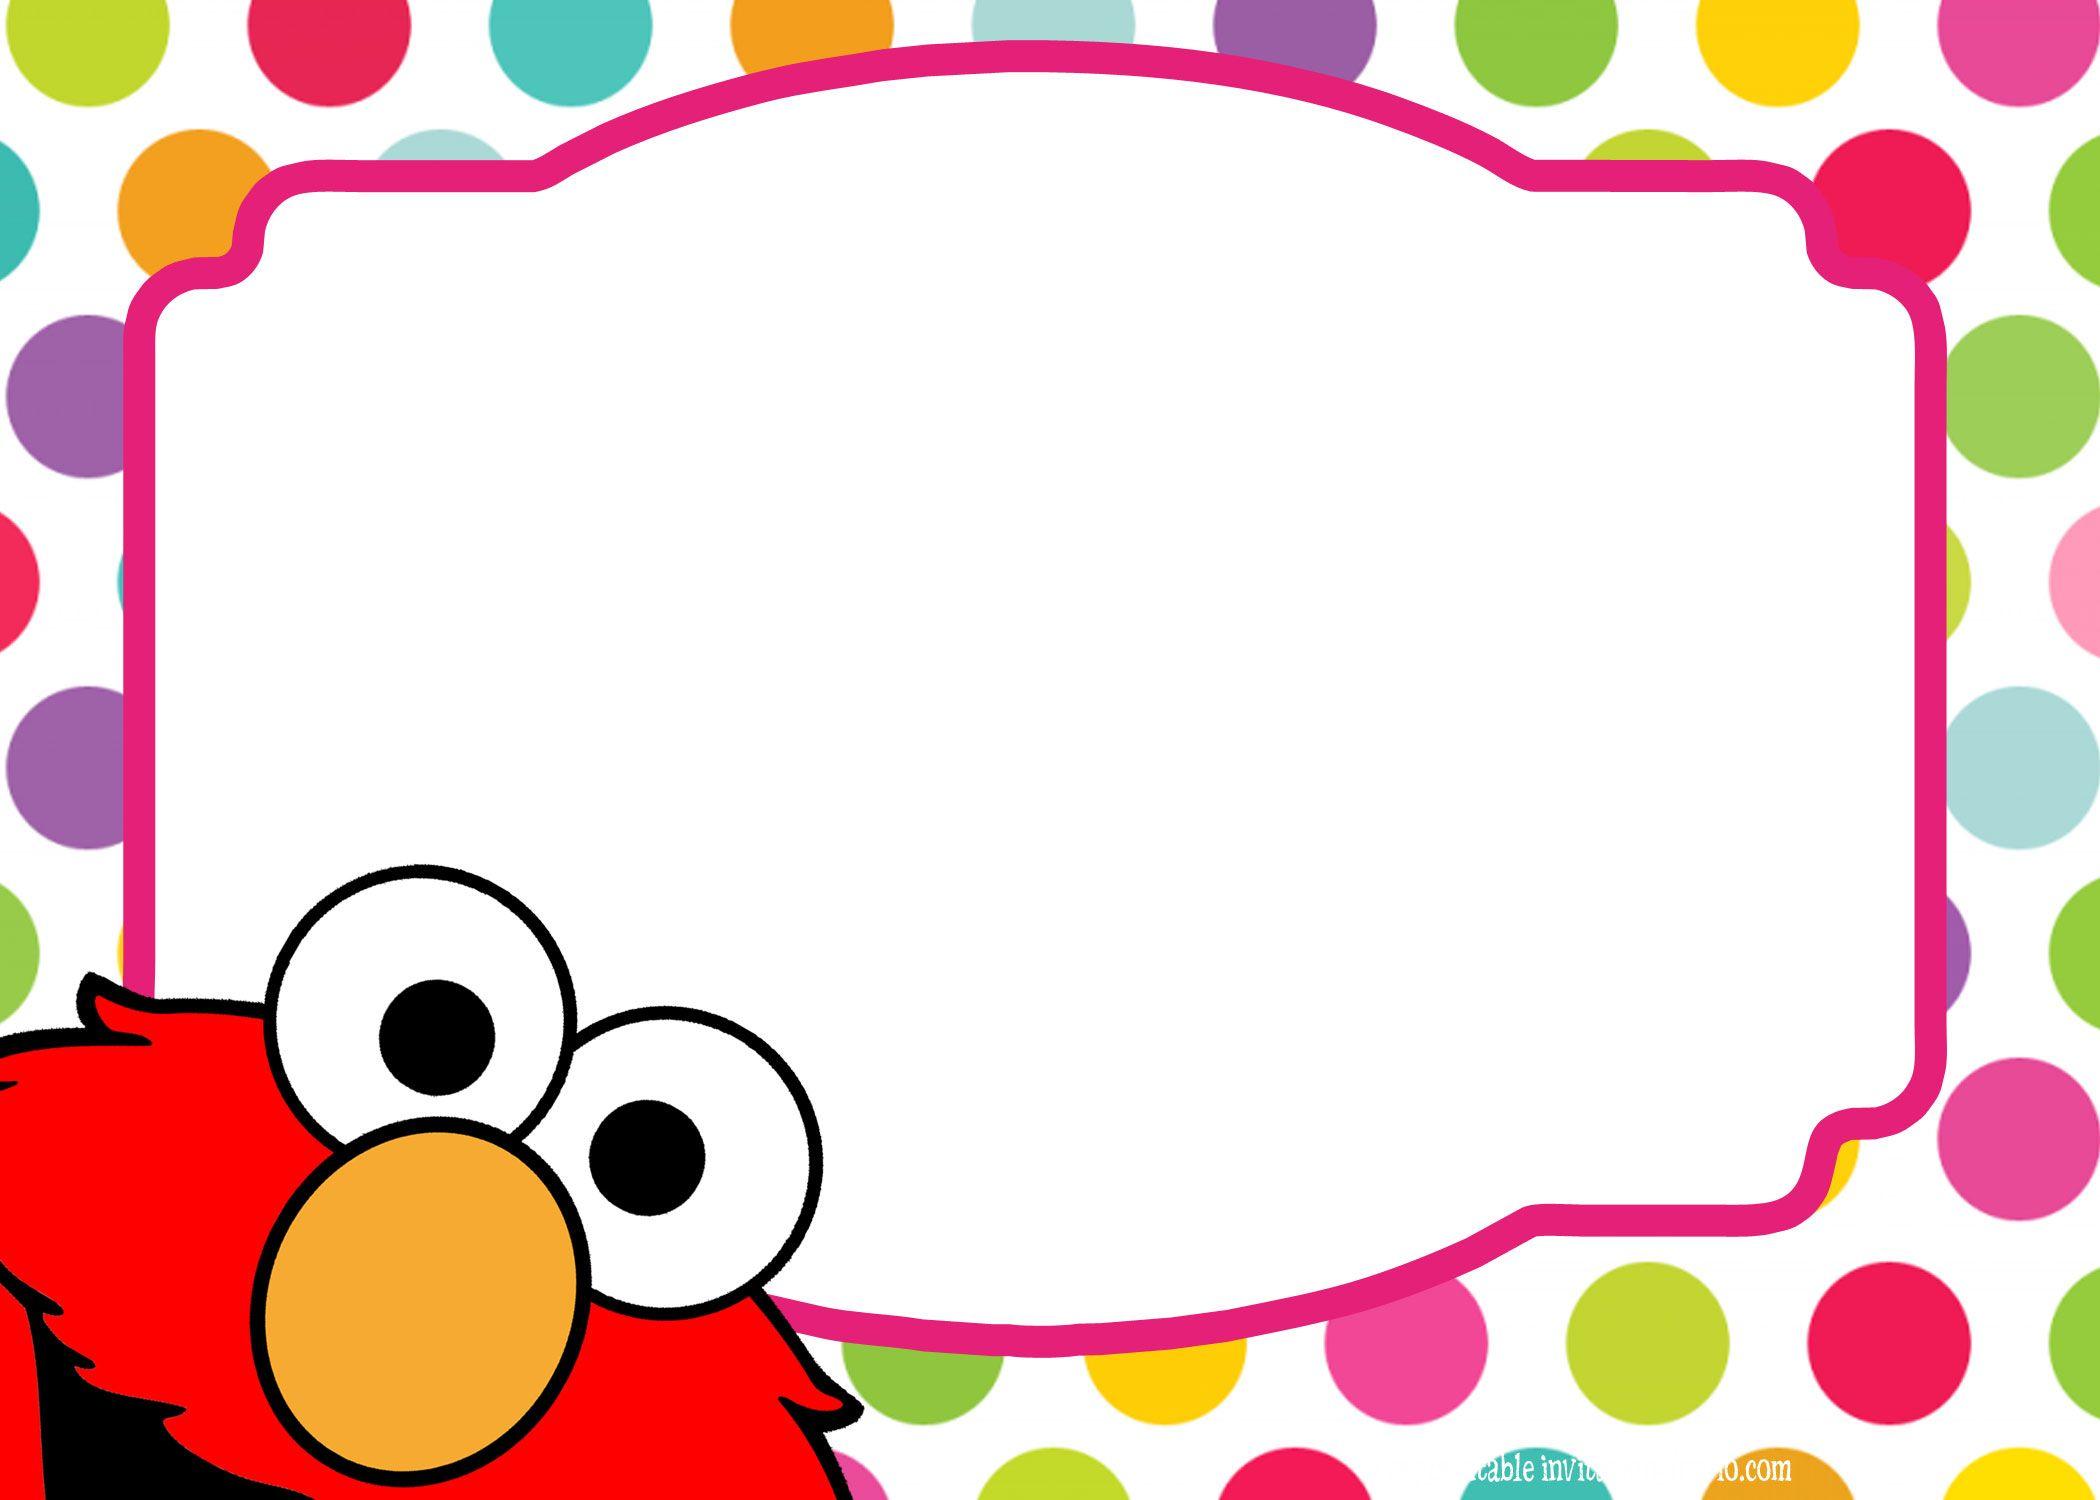 Download Sesame Street Twin Birthday Invitation Template Free - Free printable elmo birthday invitations template